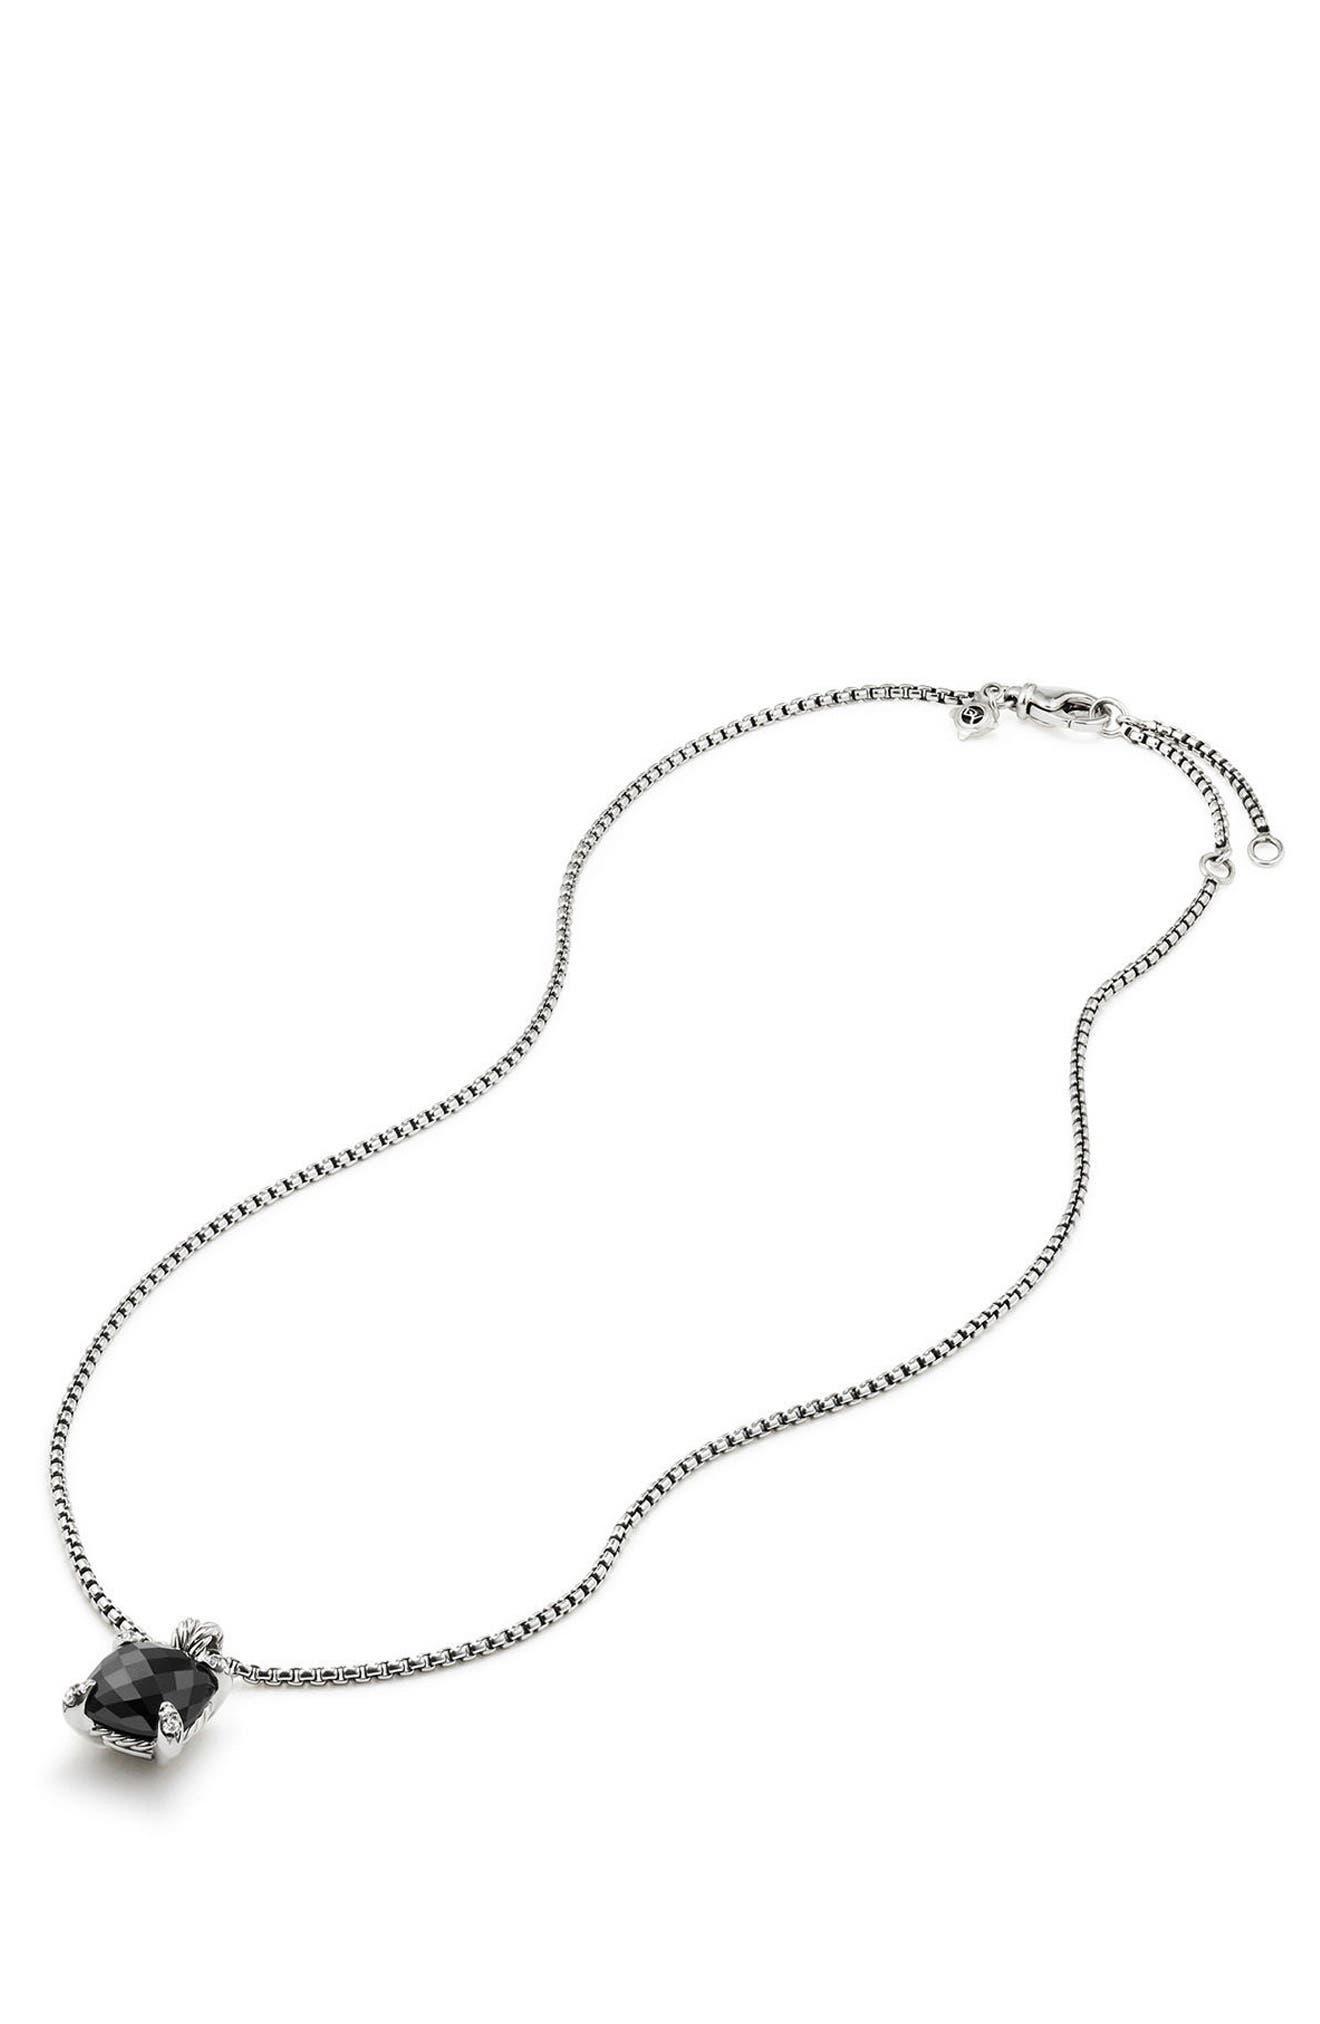 Châtelaine Pendant Necklace with Black Onyx and Diamonds,                             Alternate thumbnail 3, color,                             BLACK ONYX